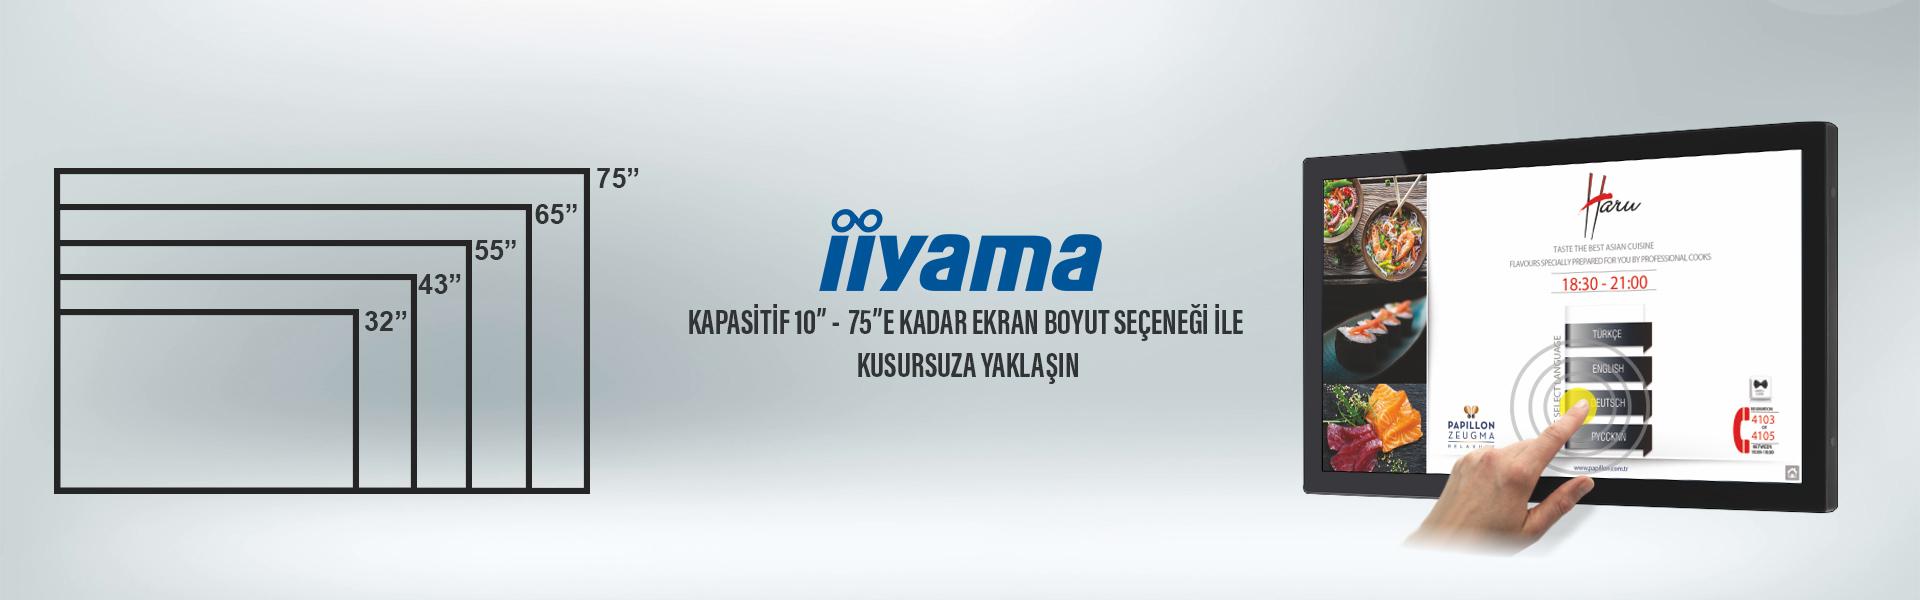 iiyama_banner_2